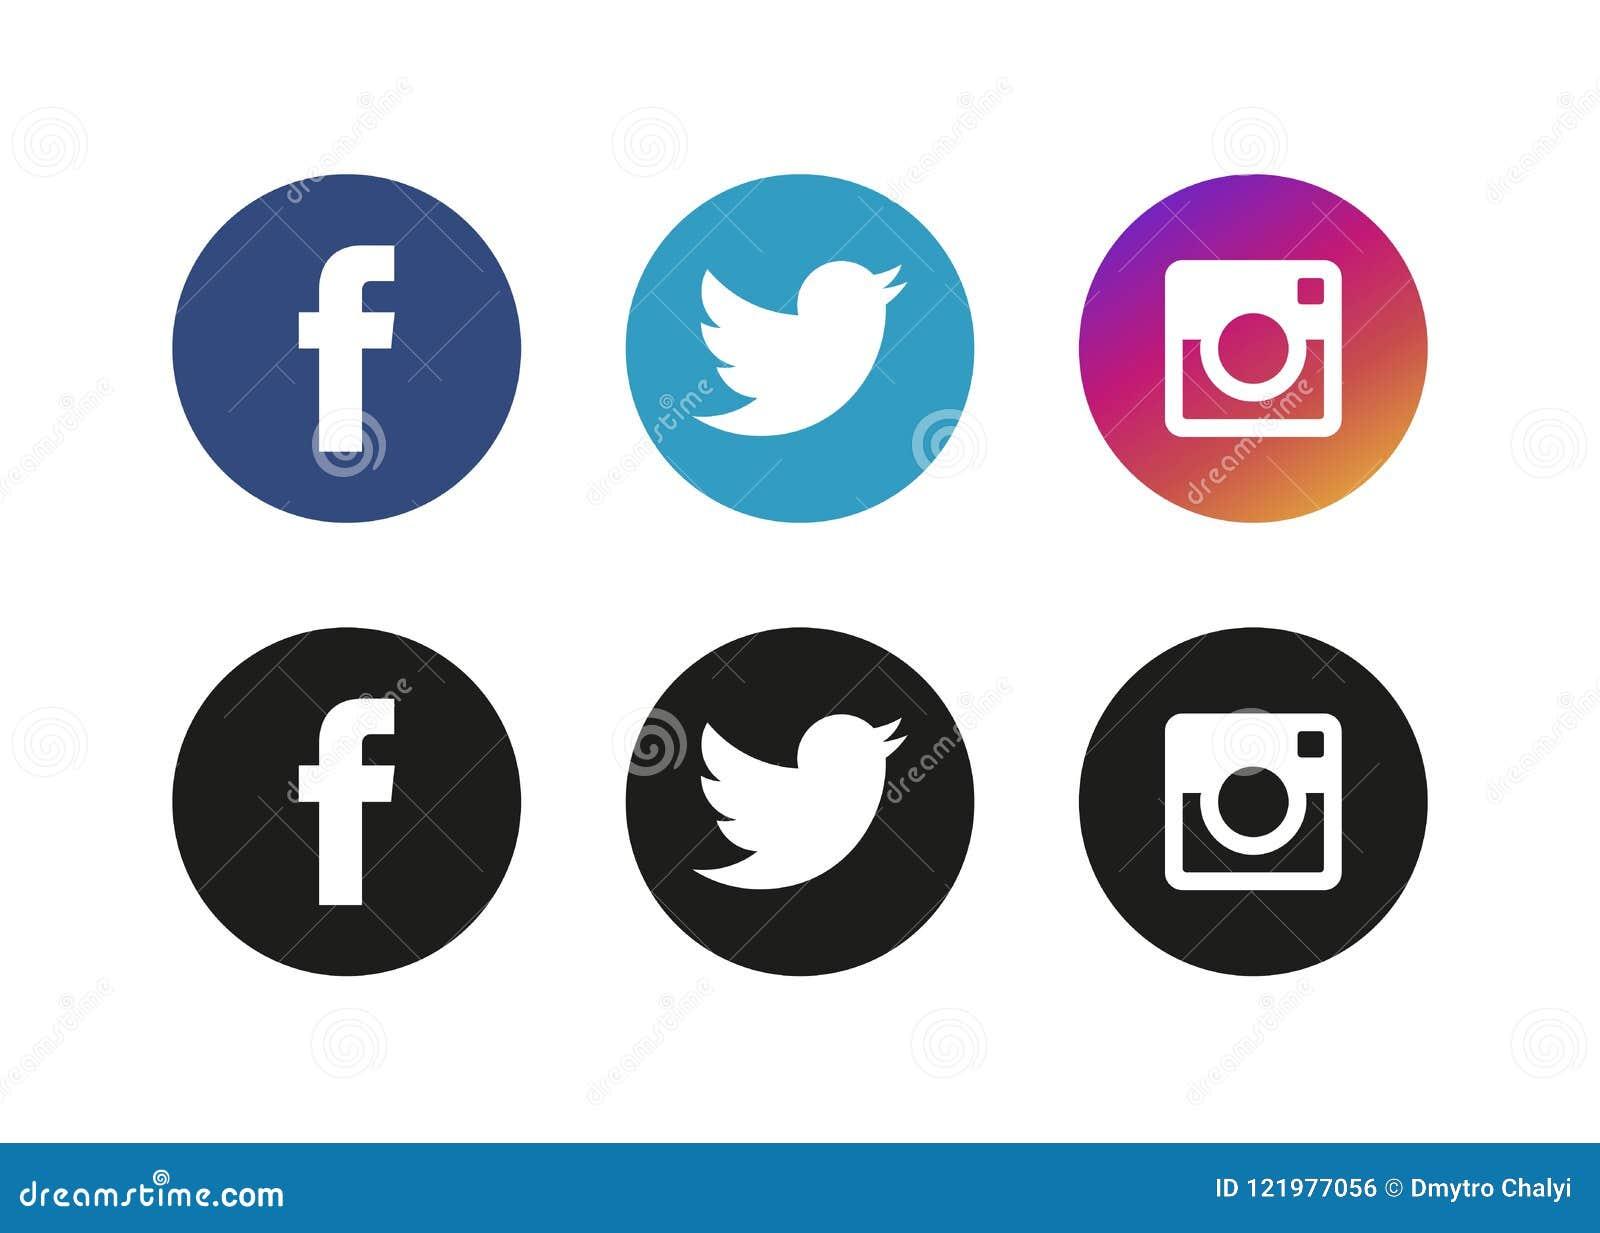 Moscou, Russie - 20 juin 2017 : Ensemble de logos sociaux populaires de media